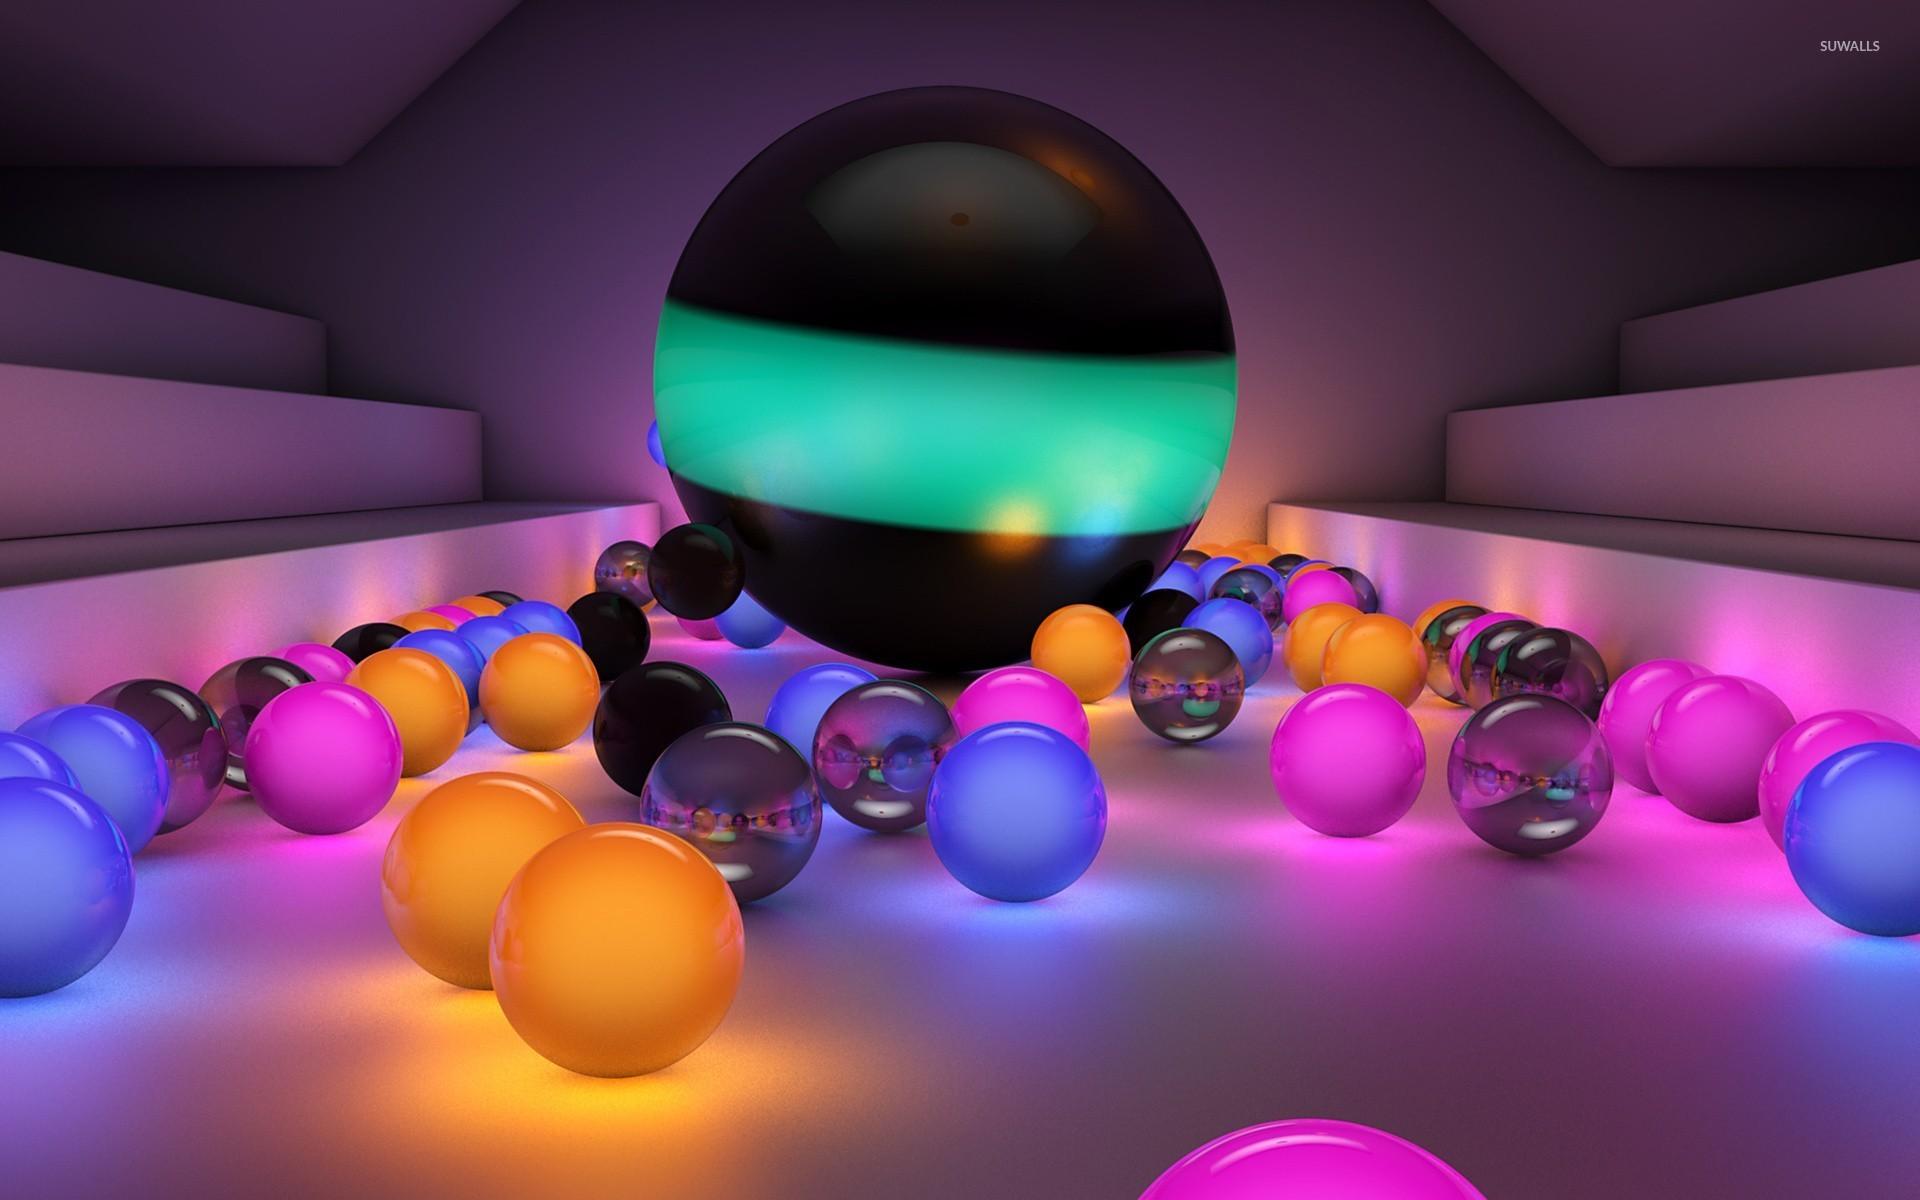 Popular Wallpaper Marble Ball - glowing-marbles-24820-1920x1200  HD_70548.jpg